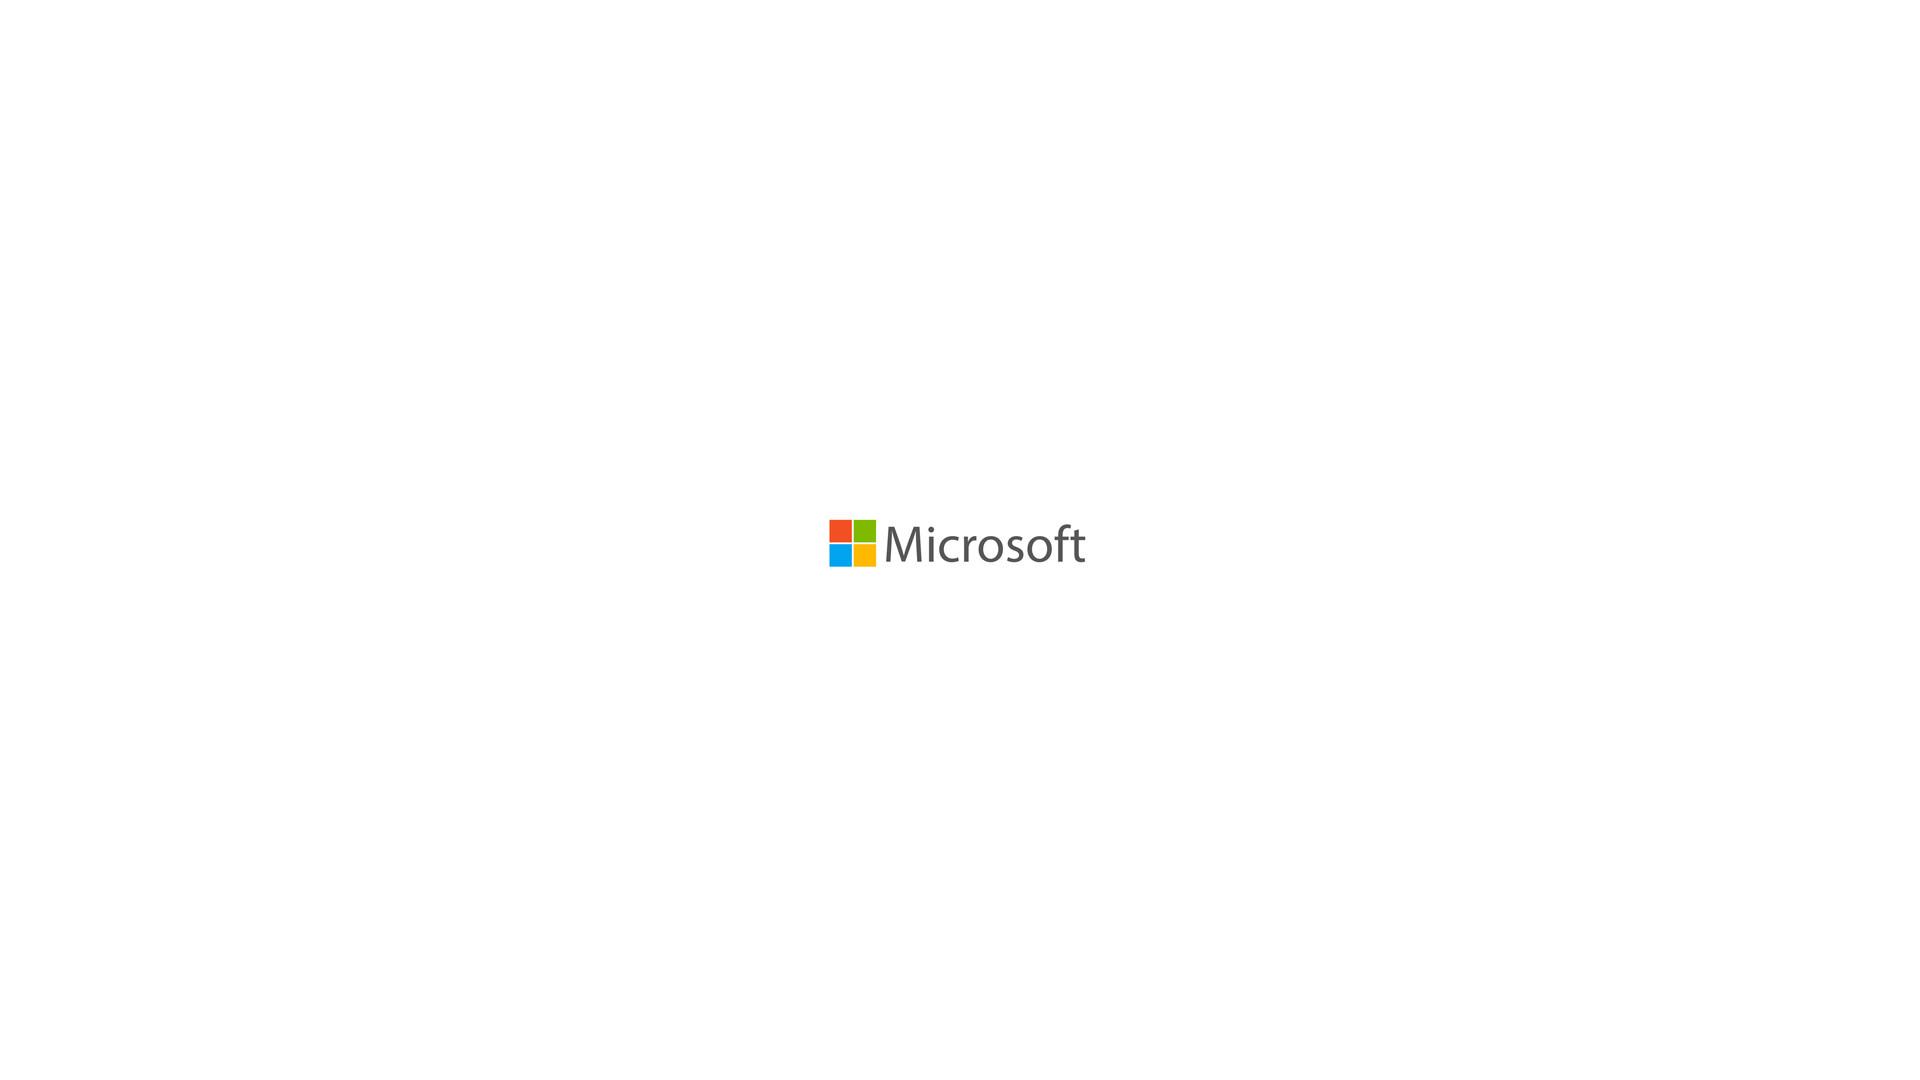 1920x1080 Description Download Microsoft Technology Wallpaper